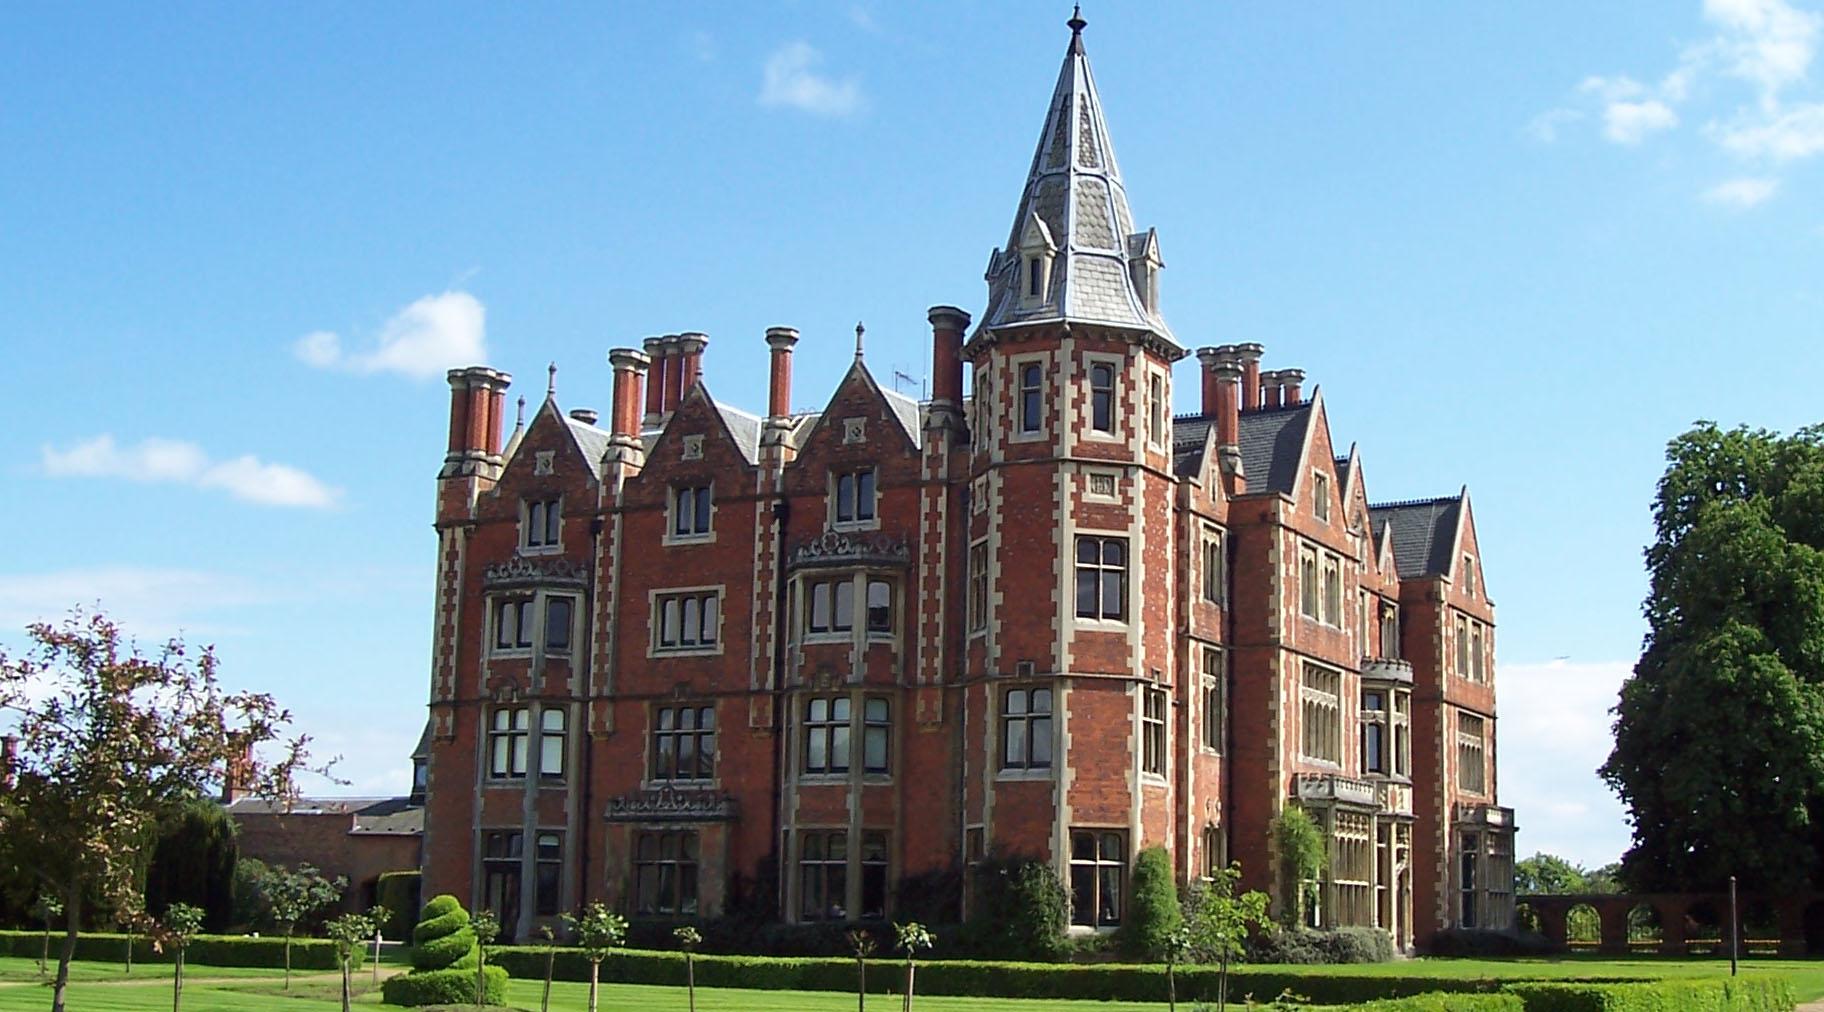 Taplow Court (Londra)